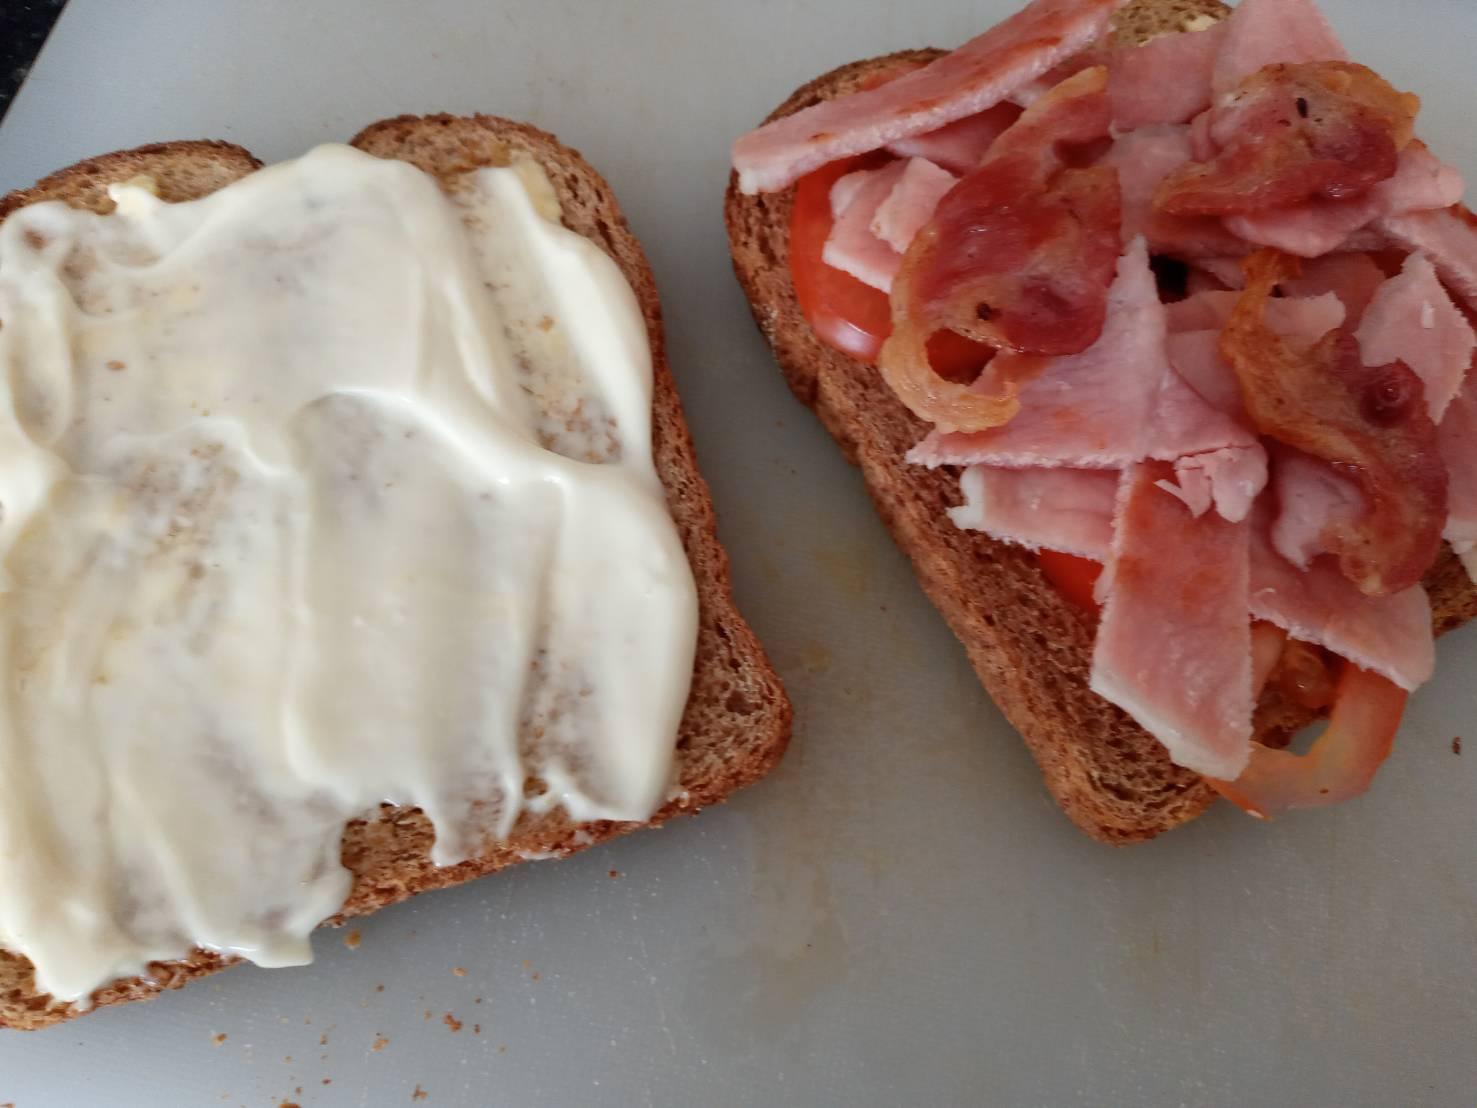 Manwiches-601-jpg